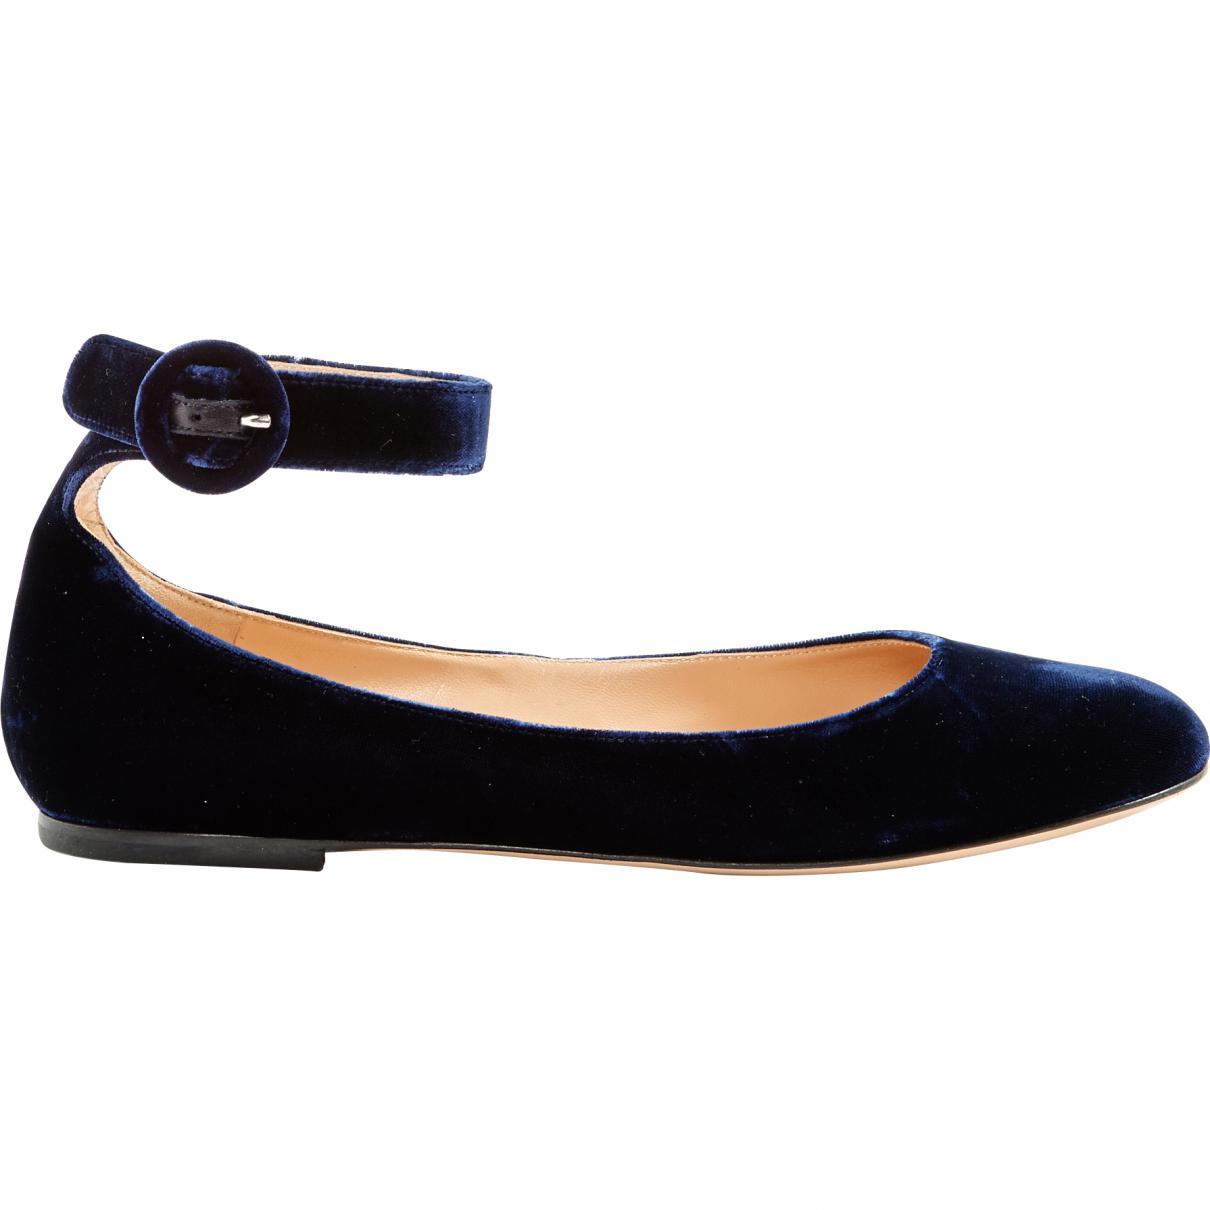 0410c7172ebf Lyst - Gianvito Rossi Navy Velvet Ballet Flats in Blue - Save 8%